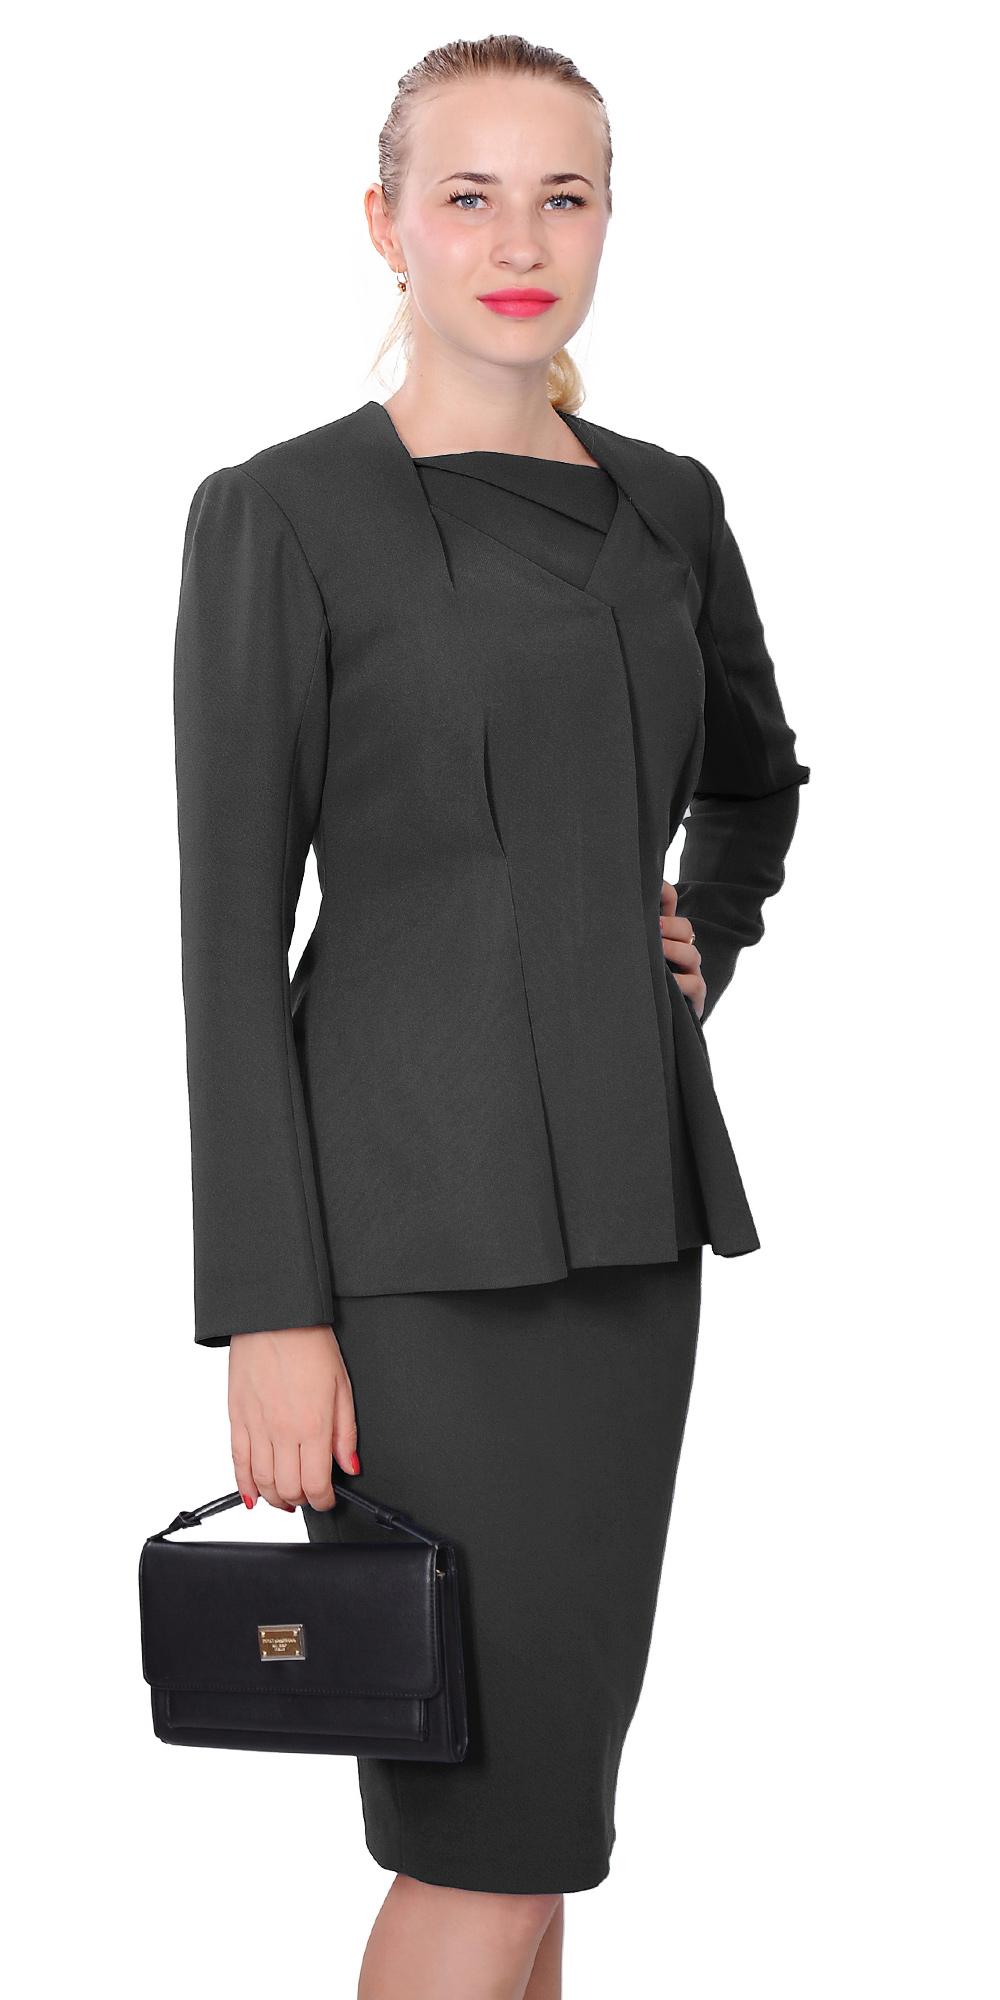 Womens Wear To Work Classy Elegant Lady Midi Dress Suit 4 Church